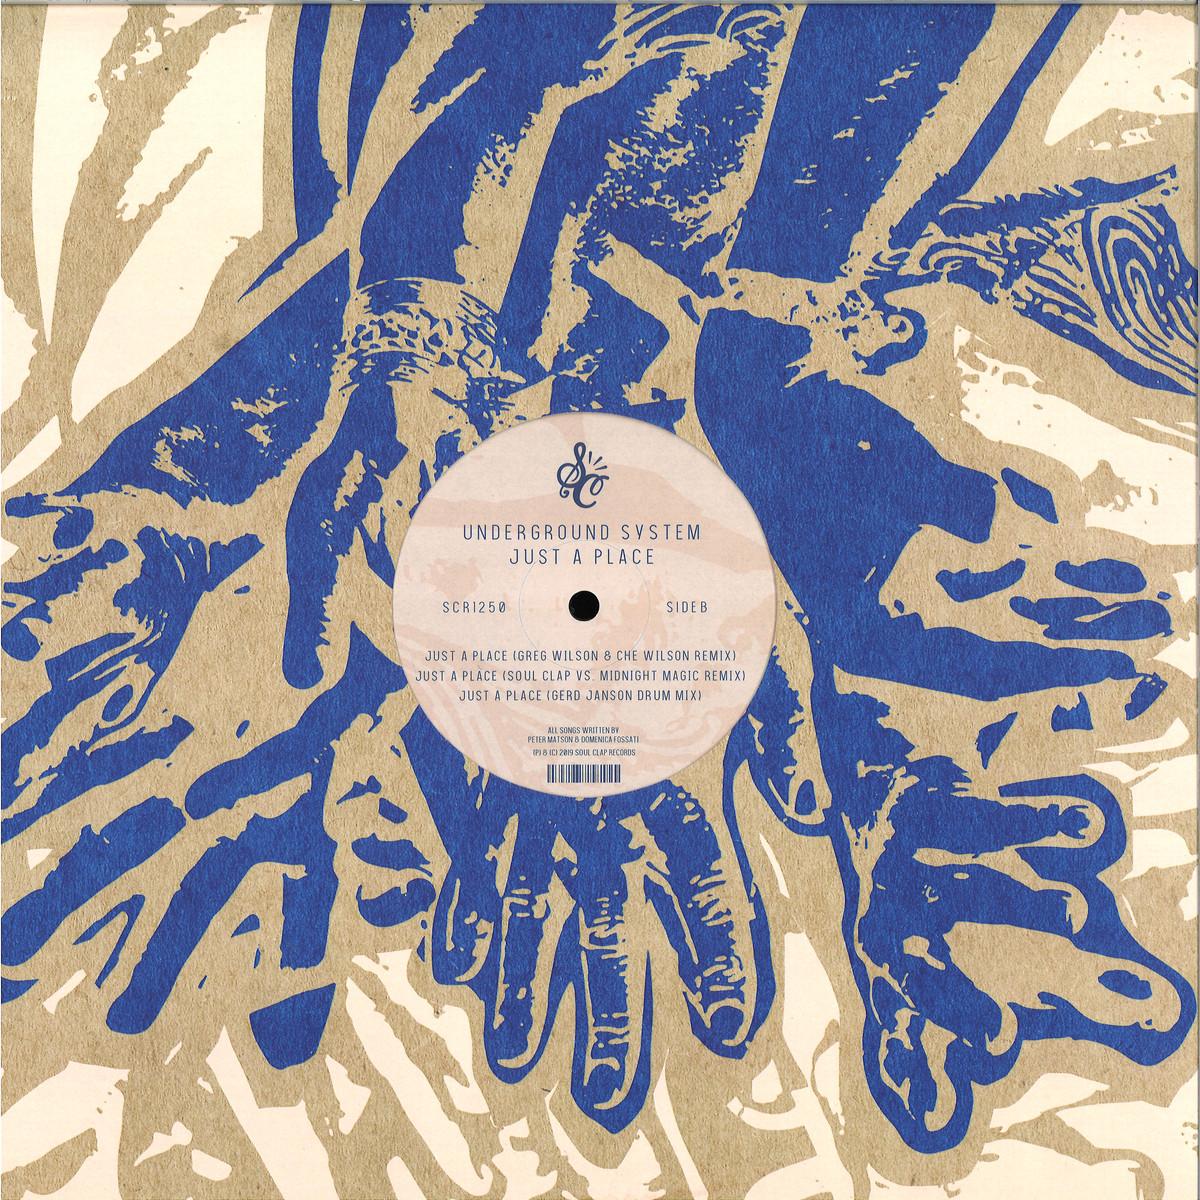 Underground System - Just A Place (Gerd Janson Remix) / SOUL